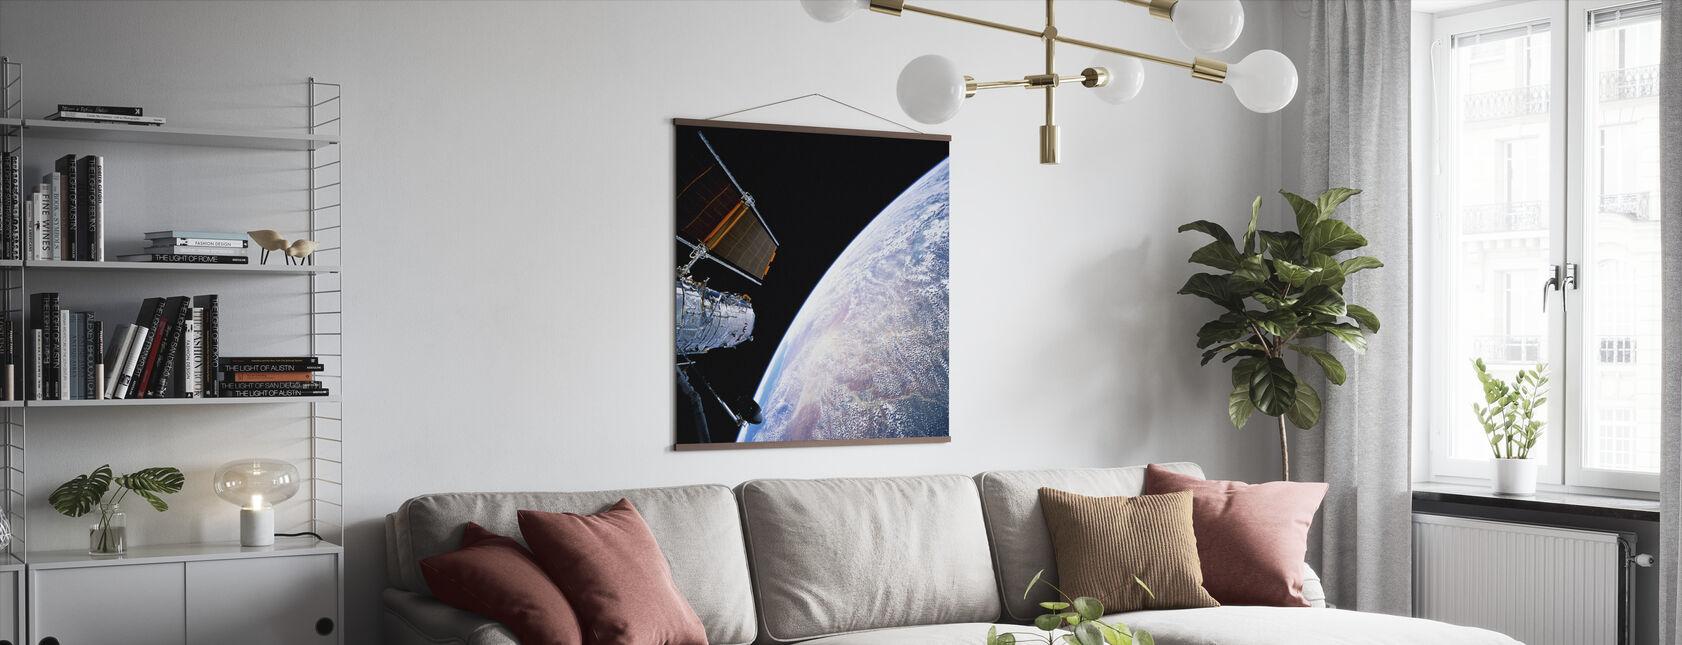 Hubble Space Teleskop - Poster - Wohnzimmer